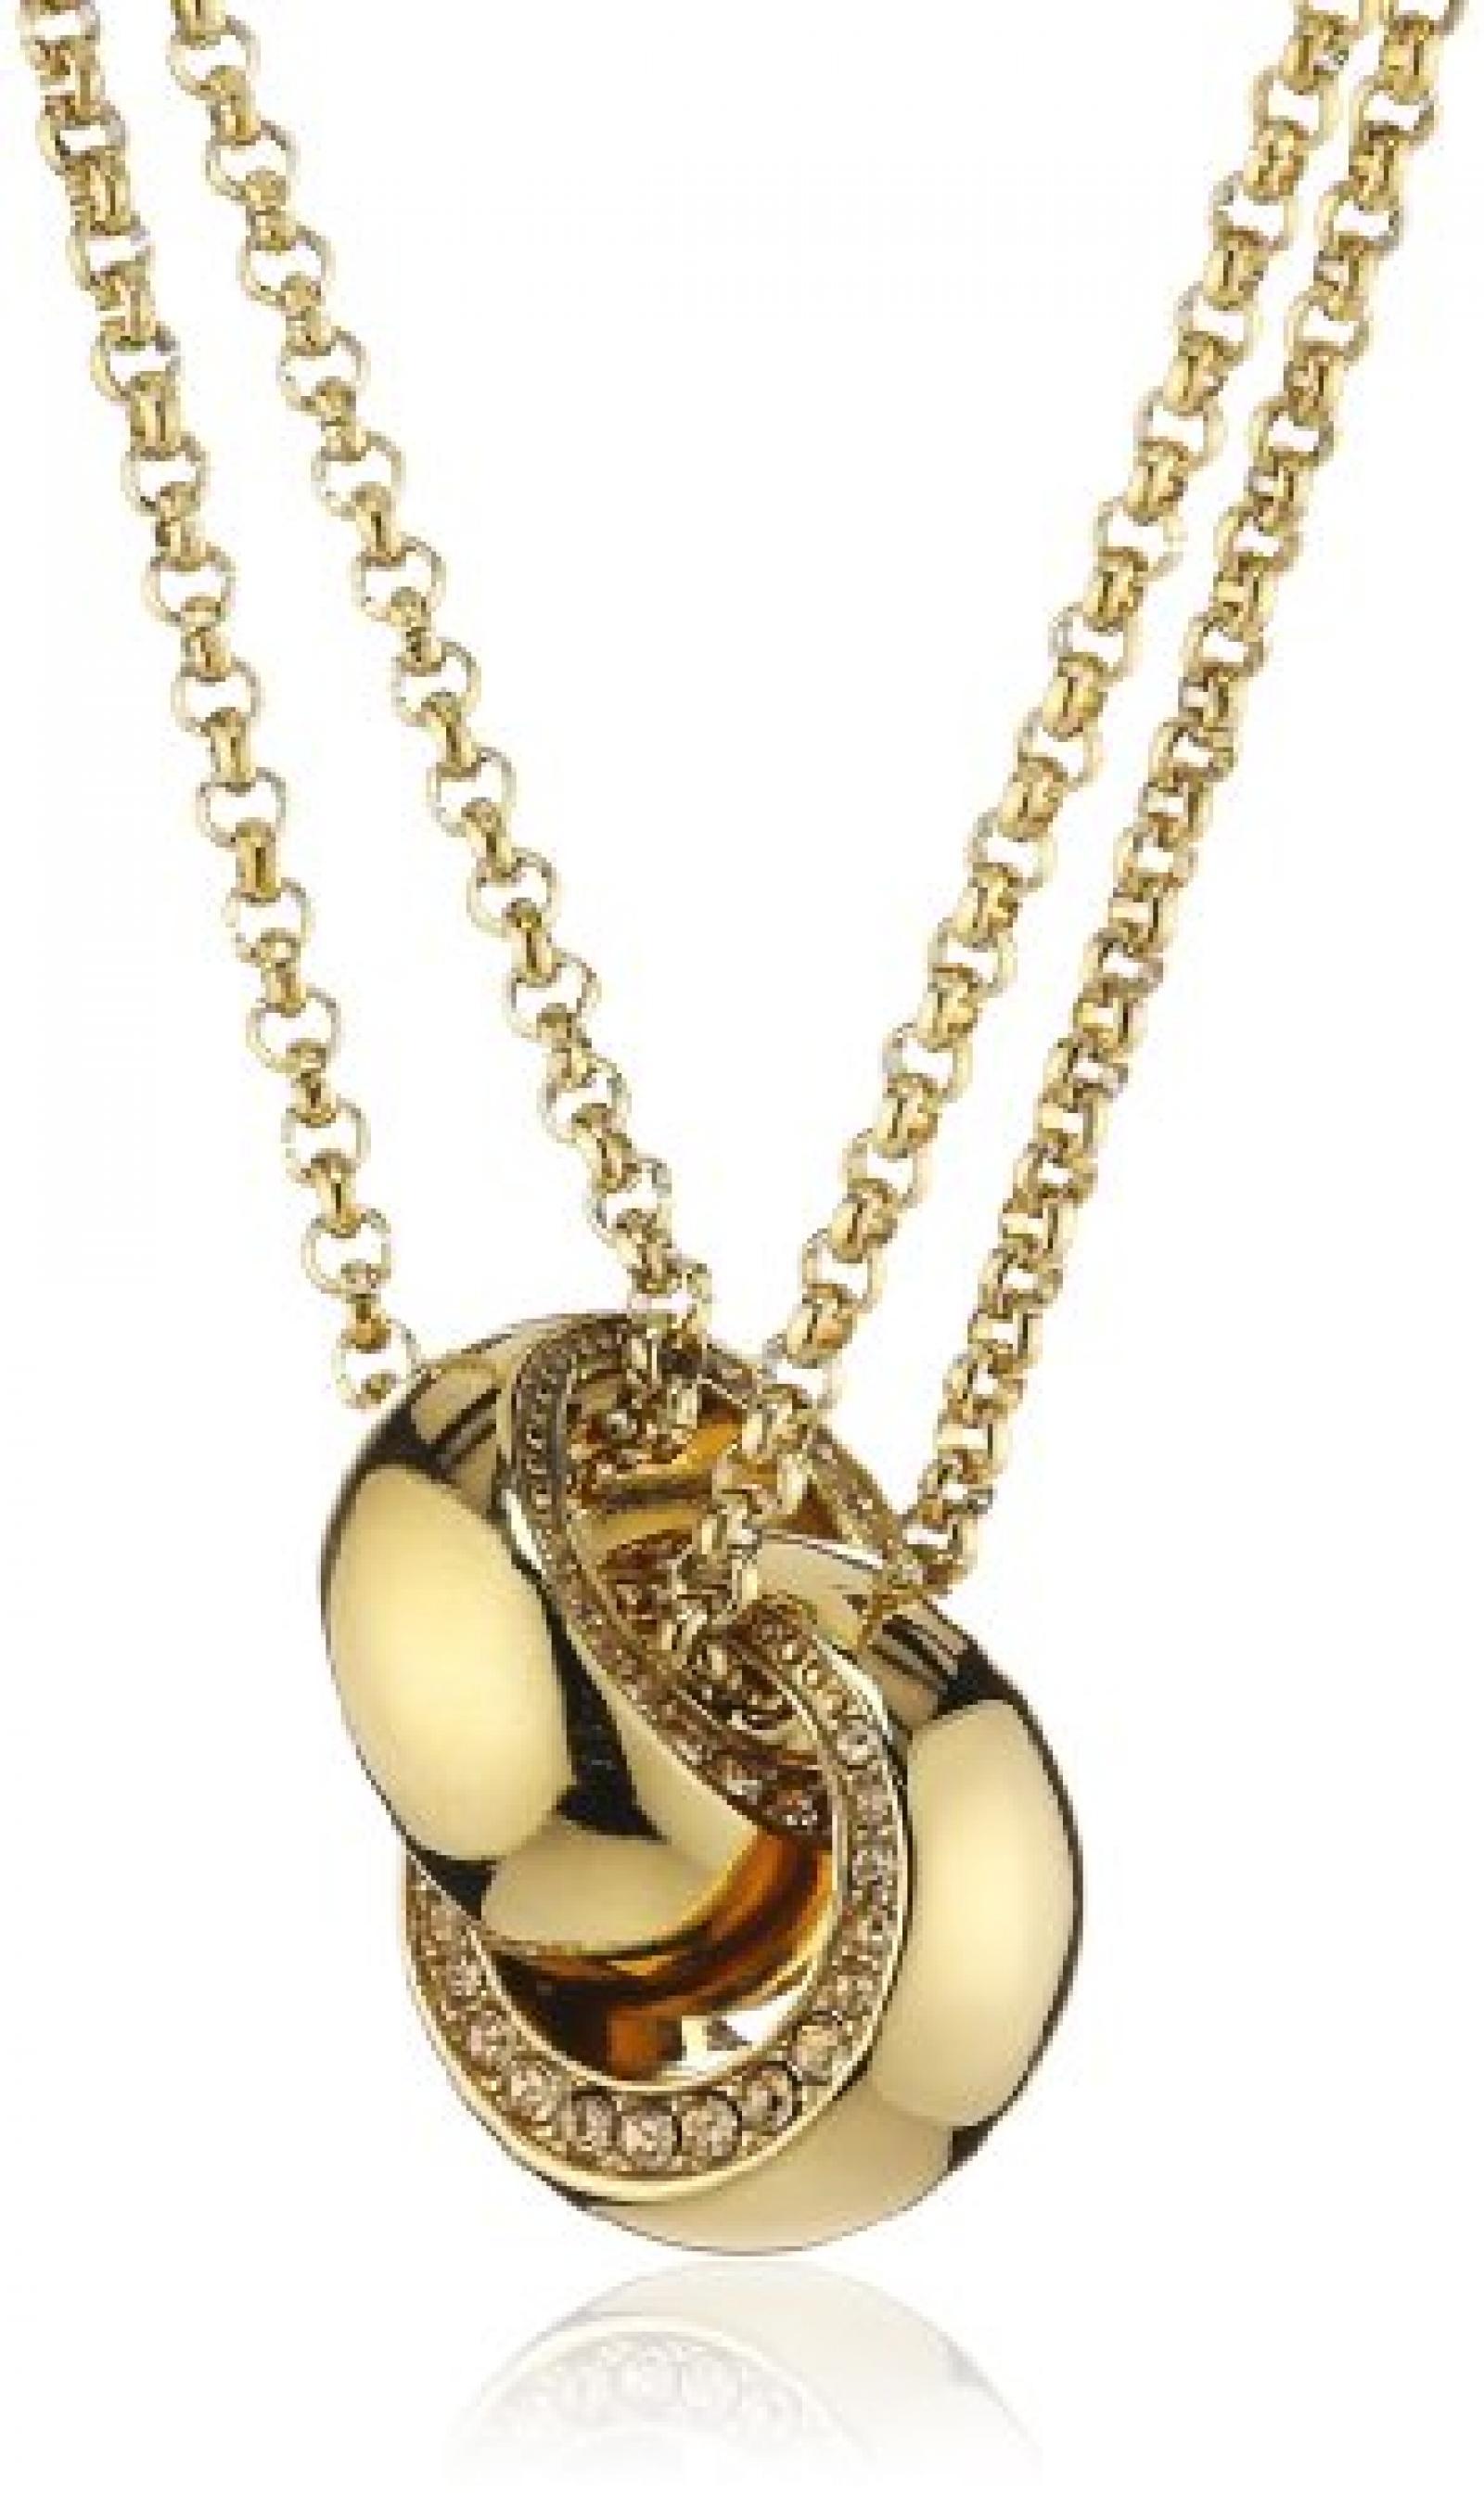 DKNY Damen-Halskette Edelstahl Zirkonia goldbeschichtet NJ1797040